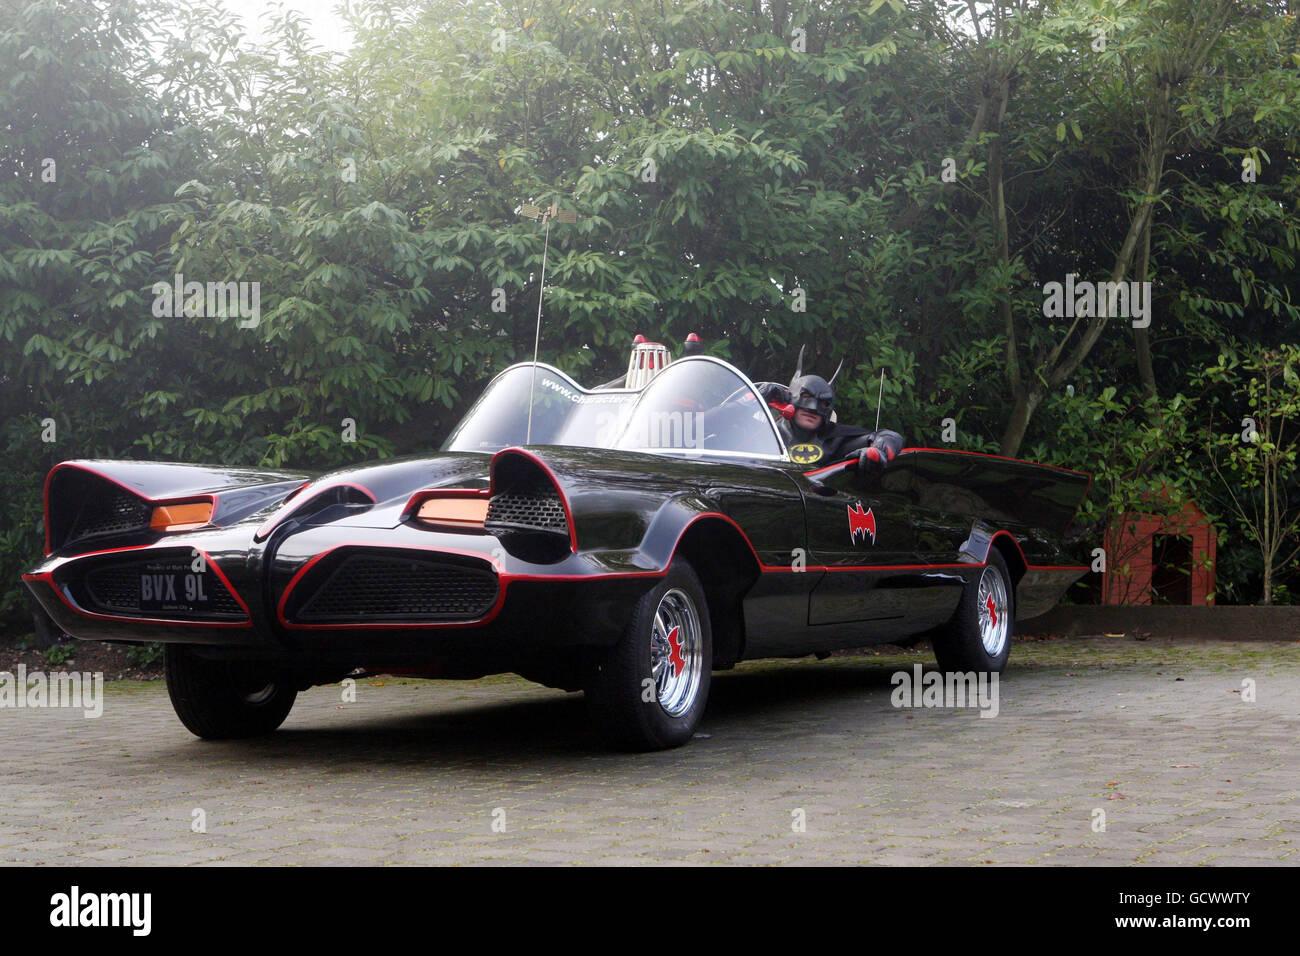 Bat Mobile Stock Photos & Bat Mobile Stock Images - Alamy